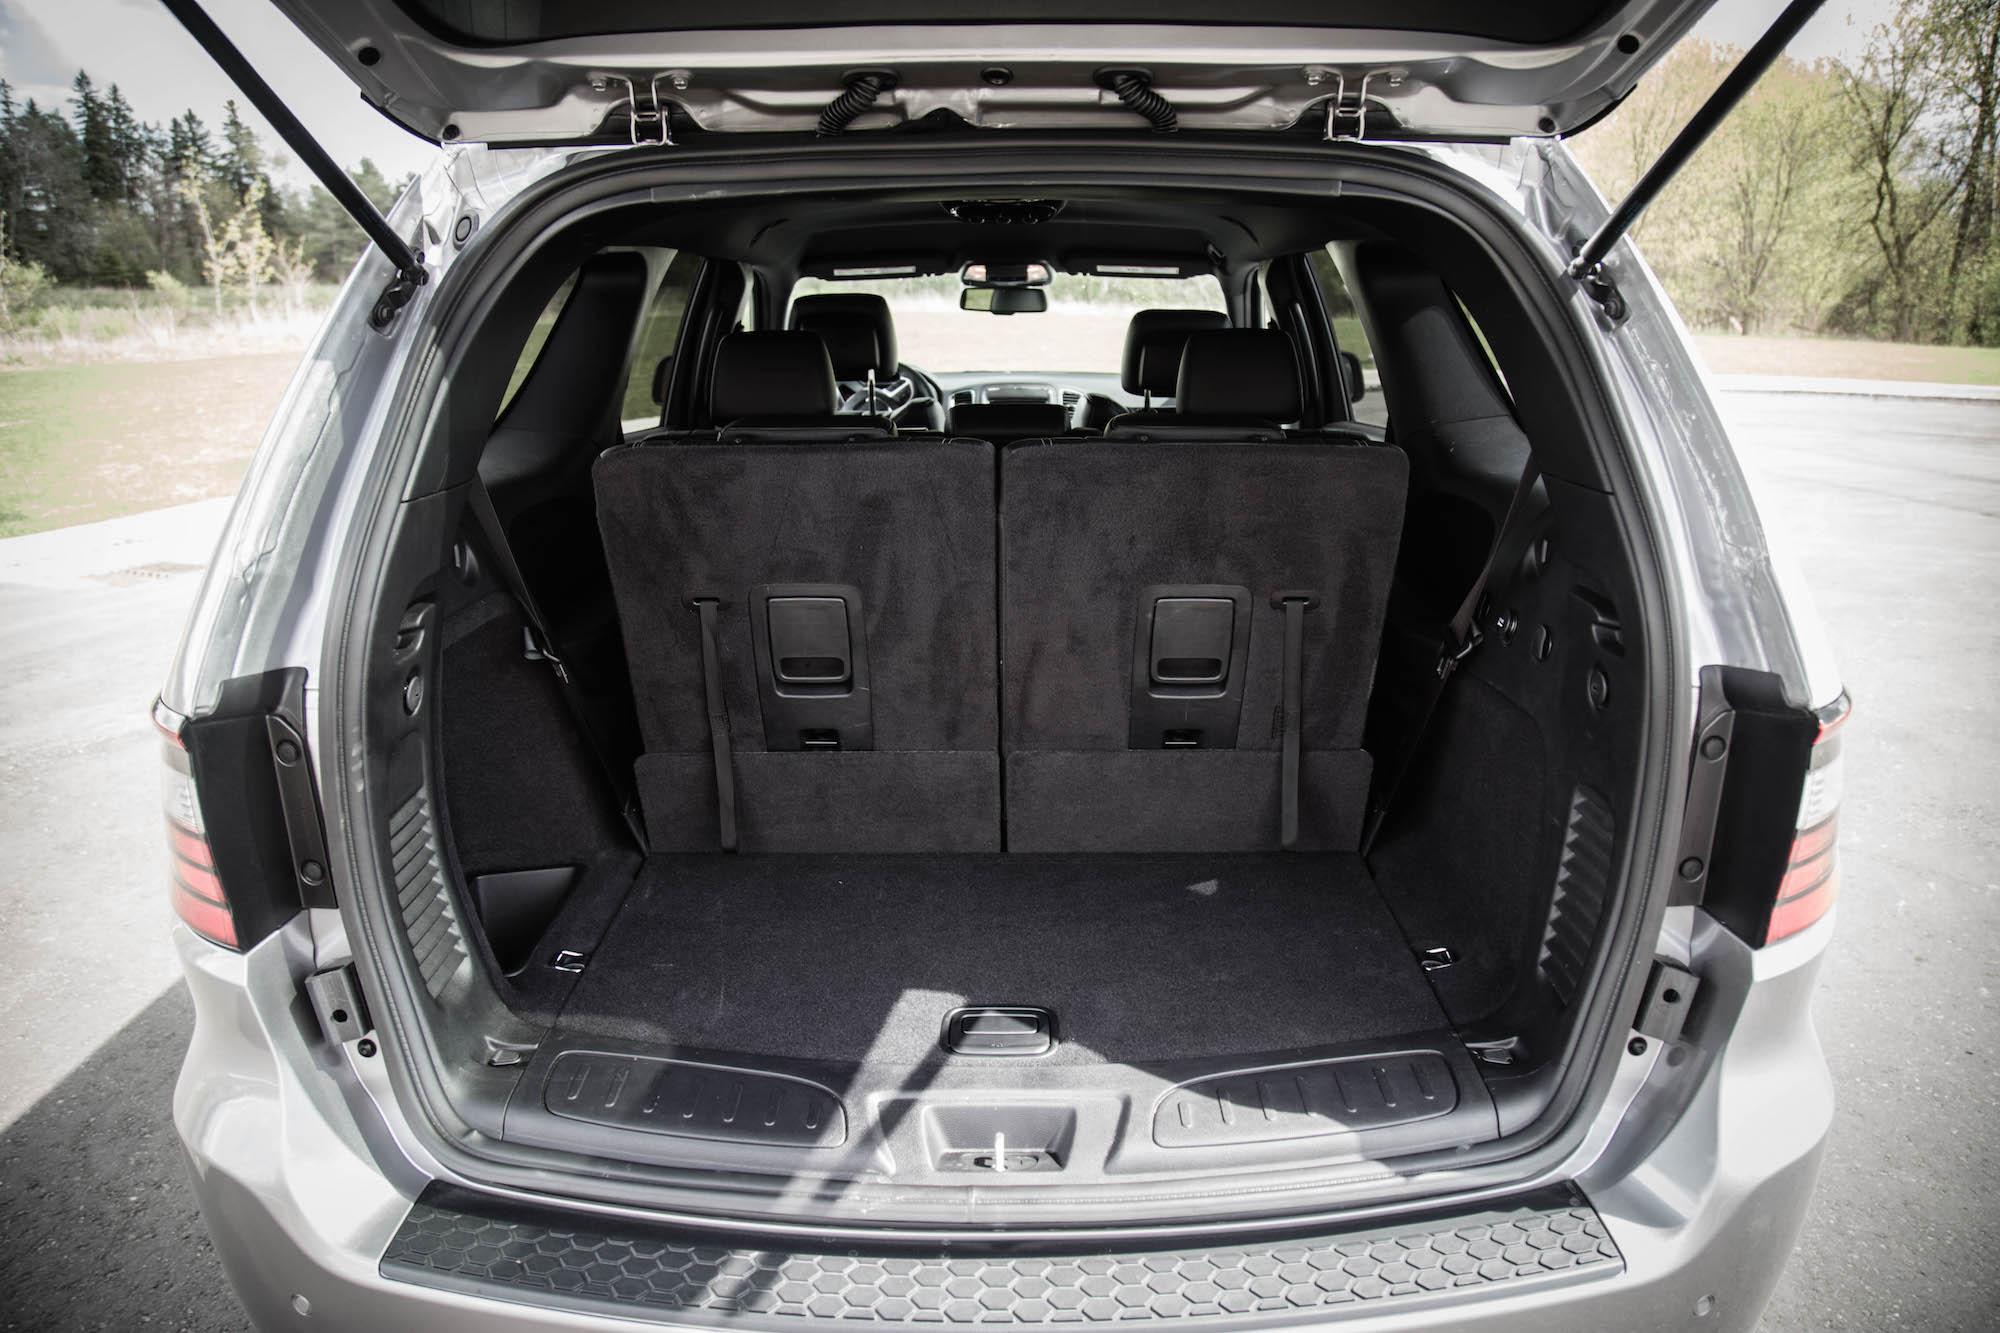 Durango Sxt Trunk on Nissan Pathfinder Transmission